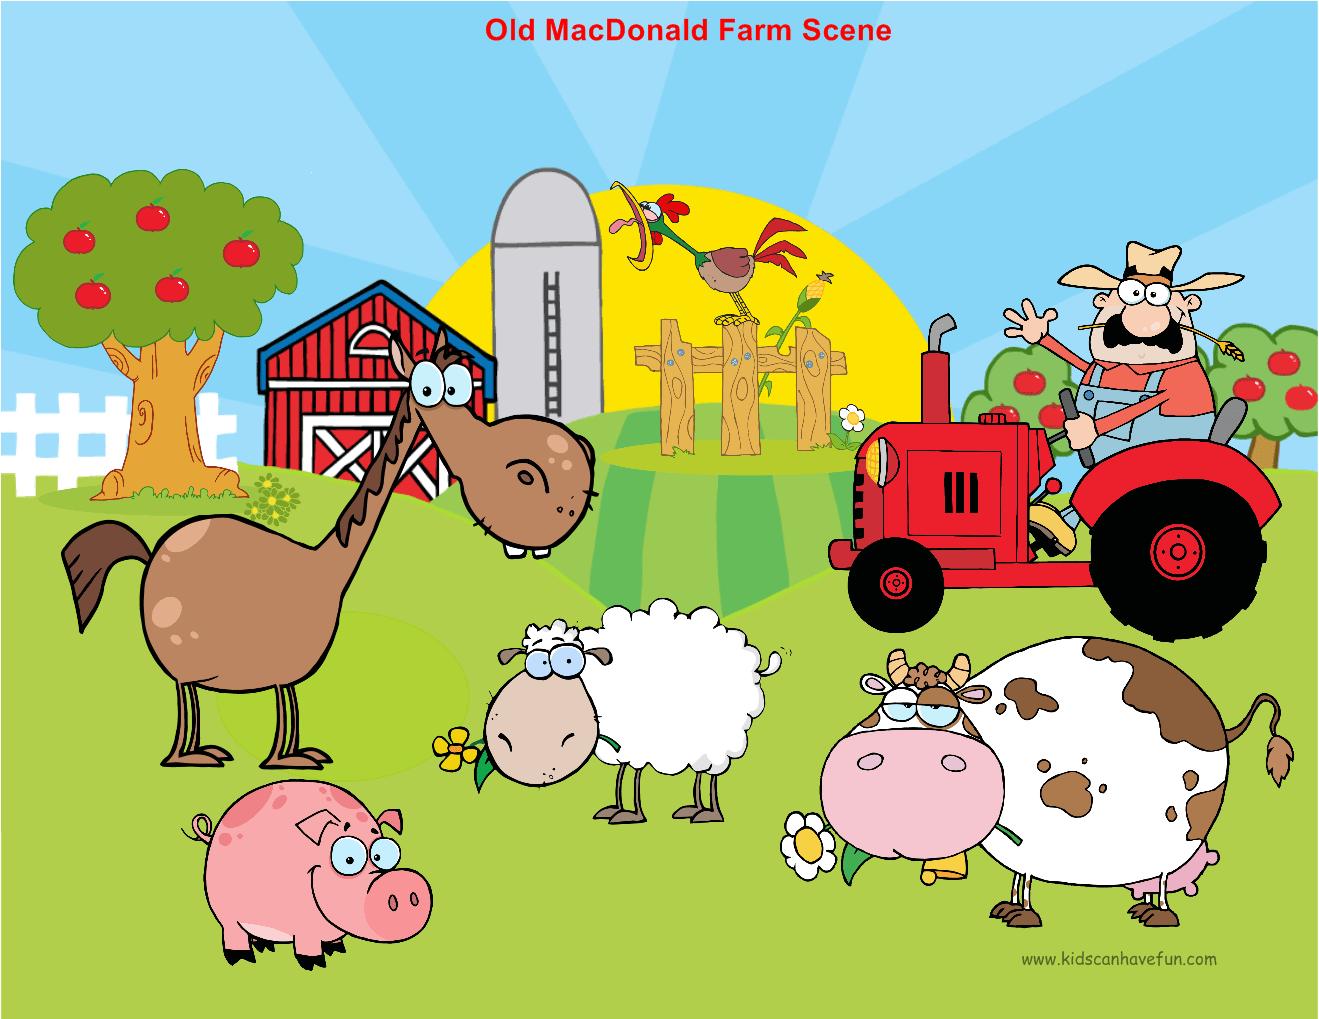 Learn how to DIY Farm Story Felt Board with Old Macdonald